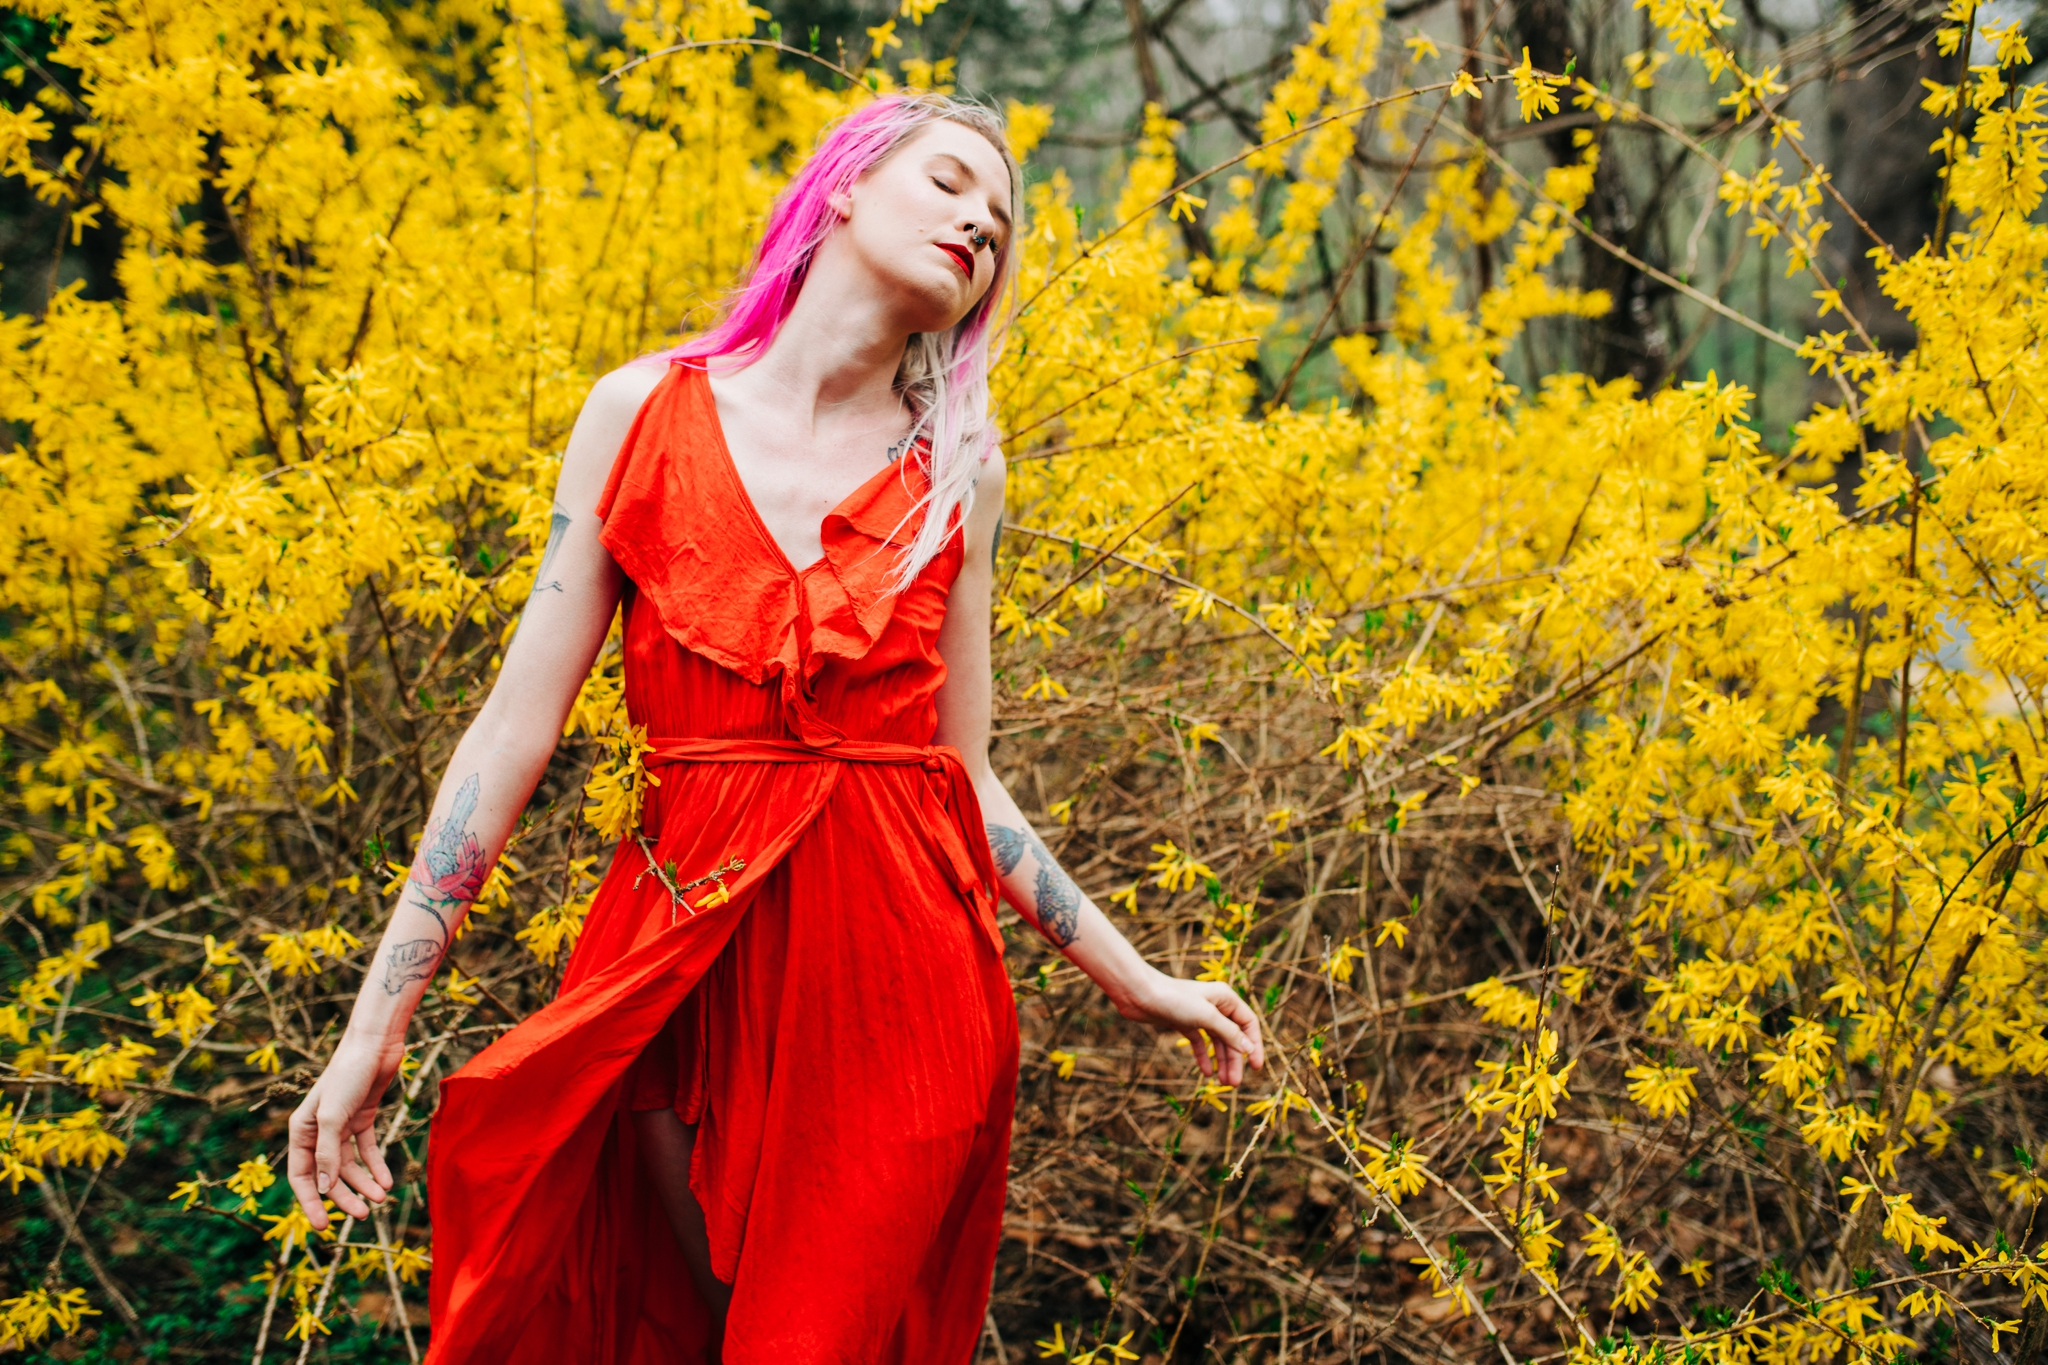 Emily Grace Photography, Lancaster PA Wedding Photographer for Adventurous Couples, Lancaster County Central Park Portrait Session, Forsythia Photo Shoot, Spring Blooms